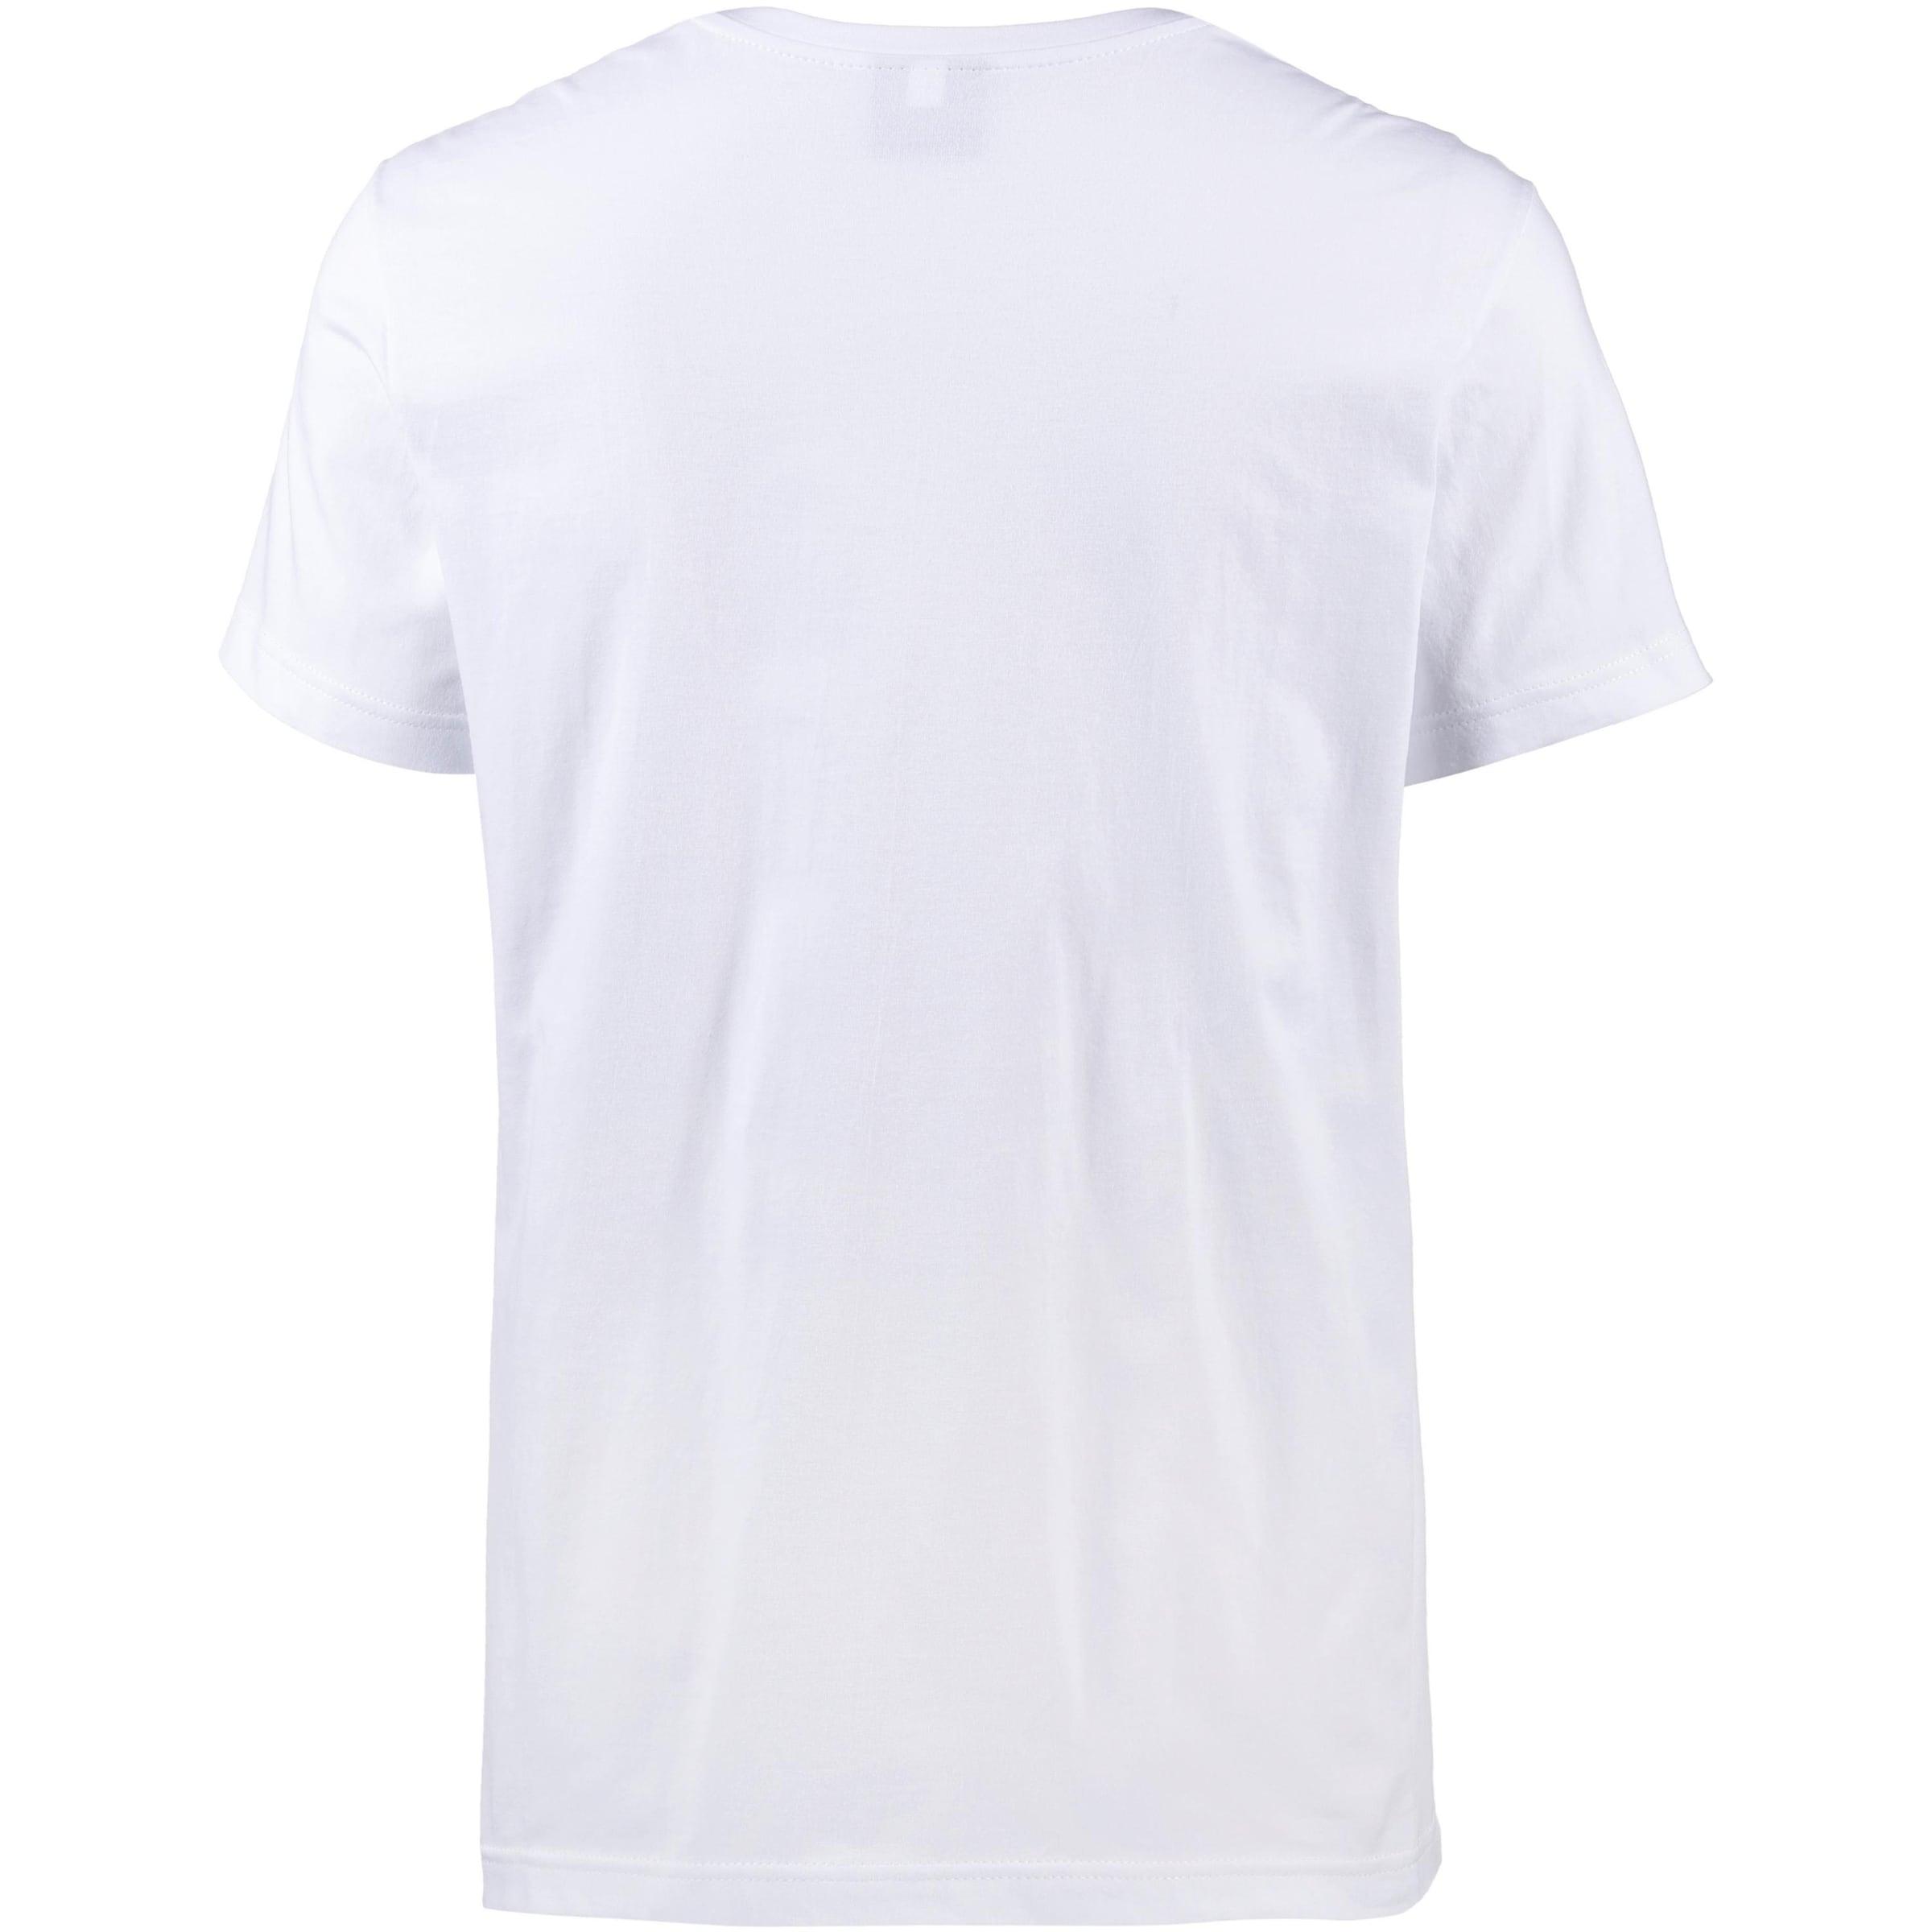 Online 100% Garantiert Freies Verschiffen Niedrigsten Preis Iriedaily T-Shirt Herren S9QNr